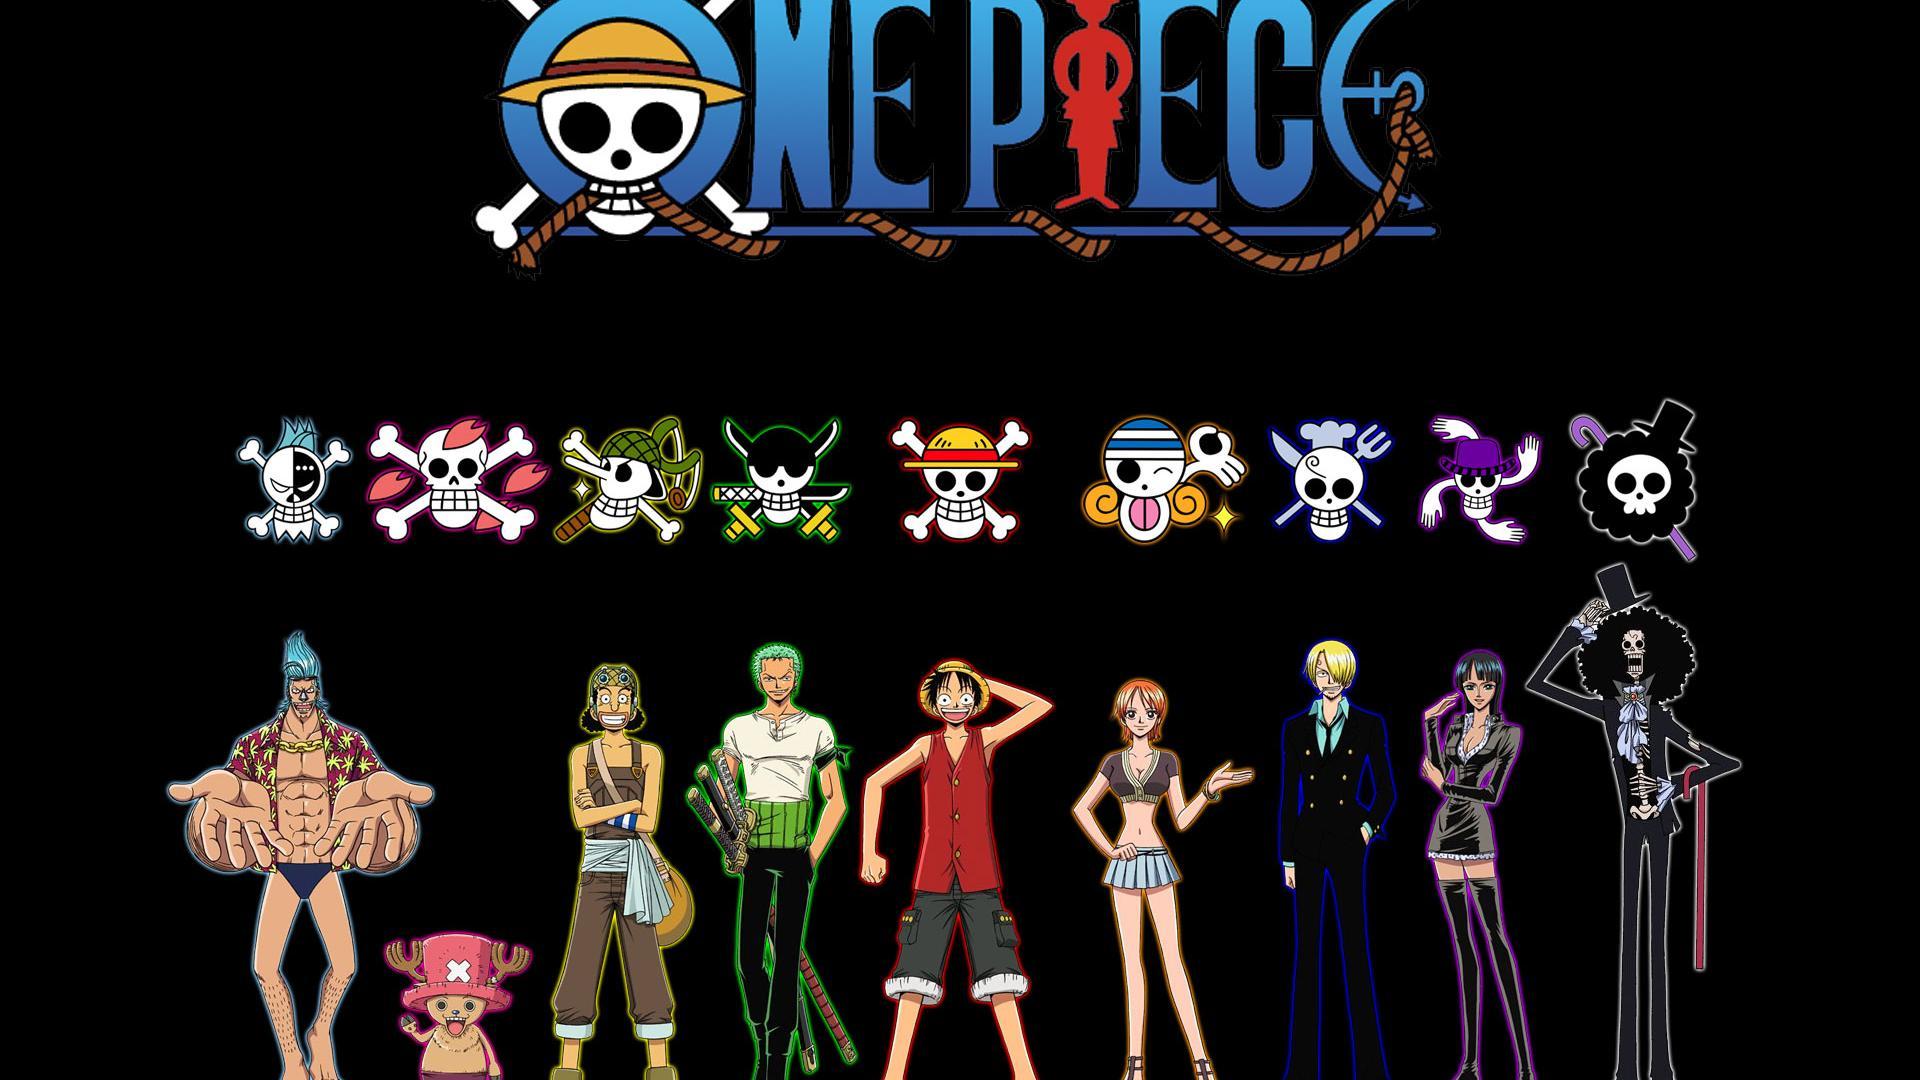 Wallpaper : One Piece, anime 1920x1080 - Geravys - 1199550